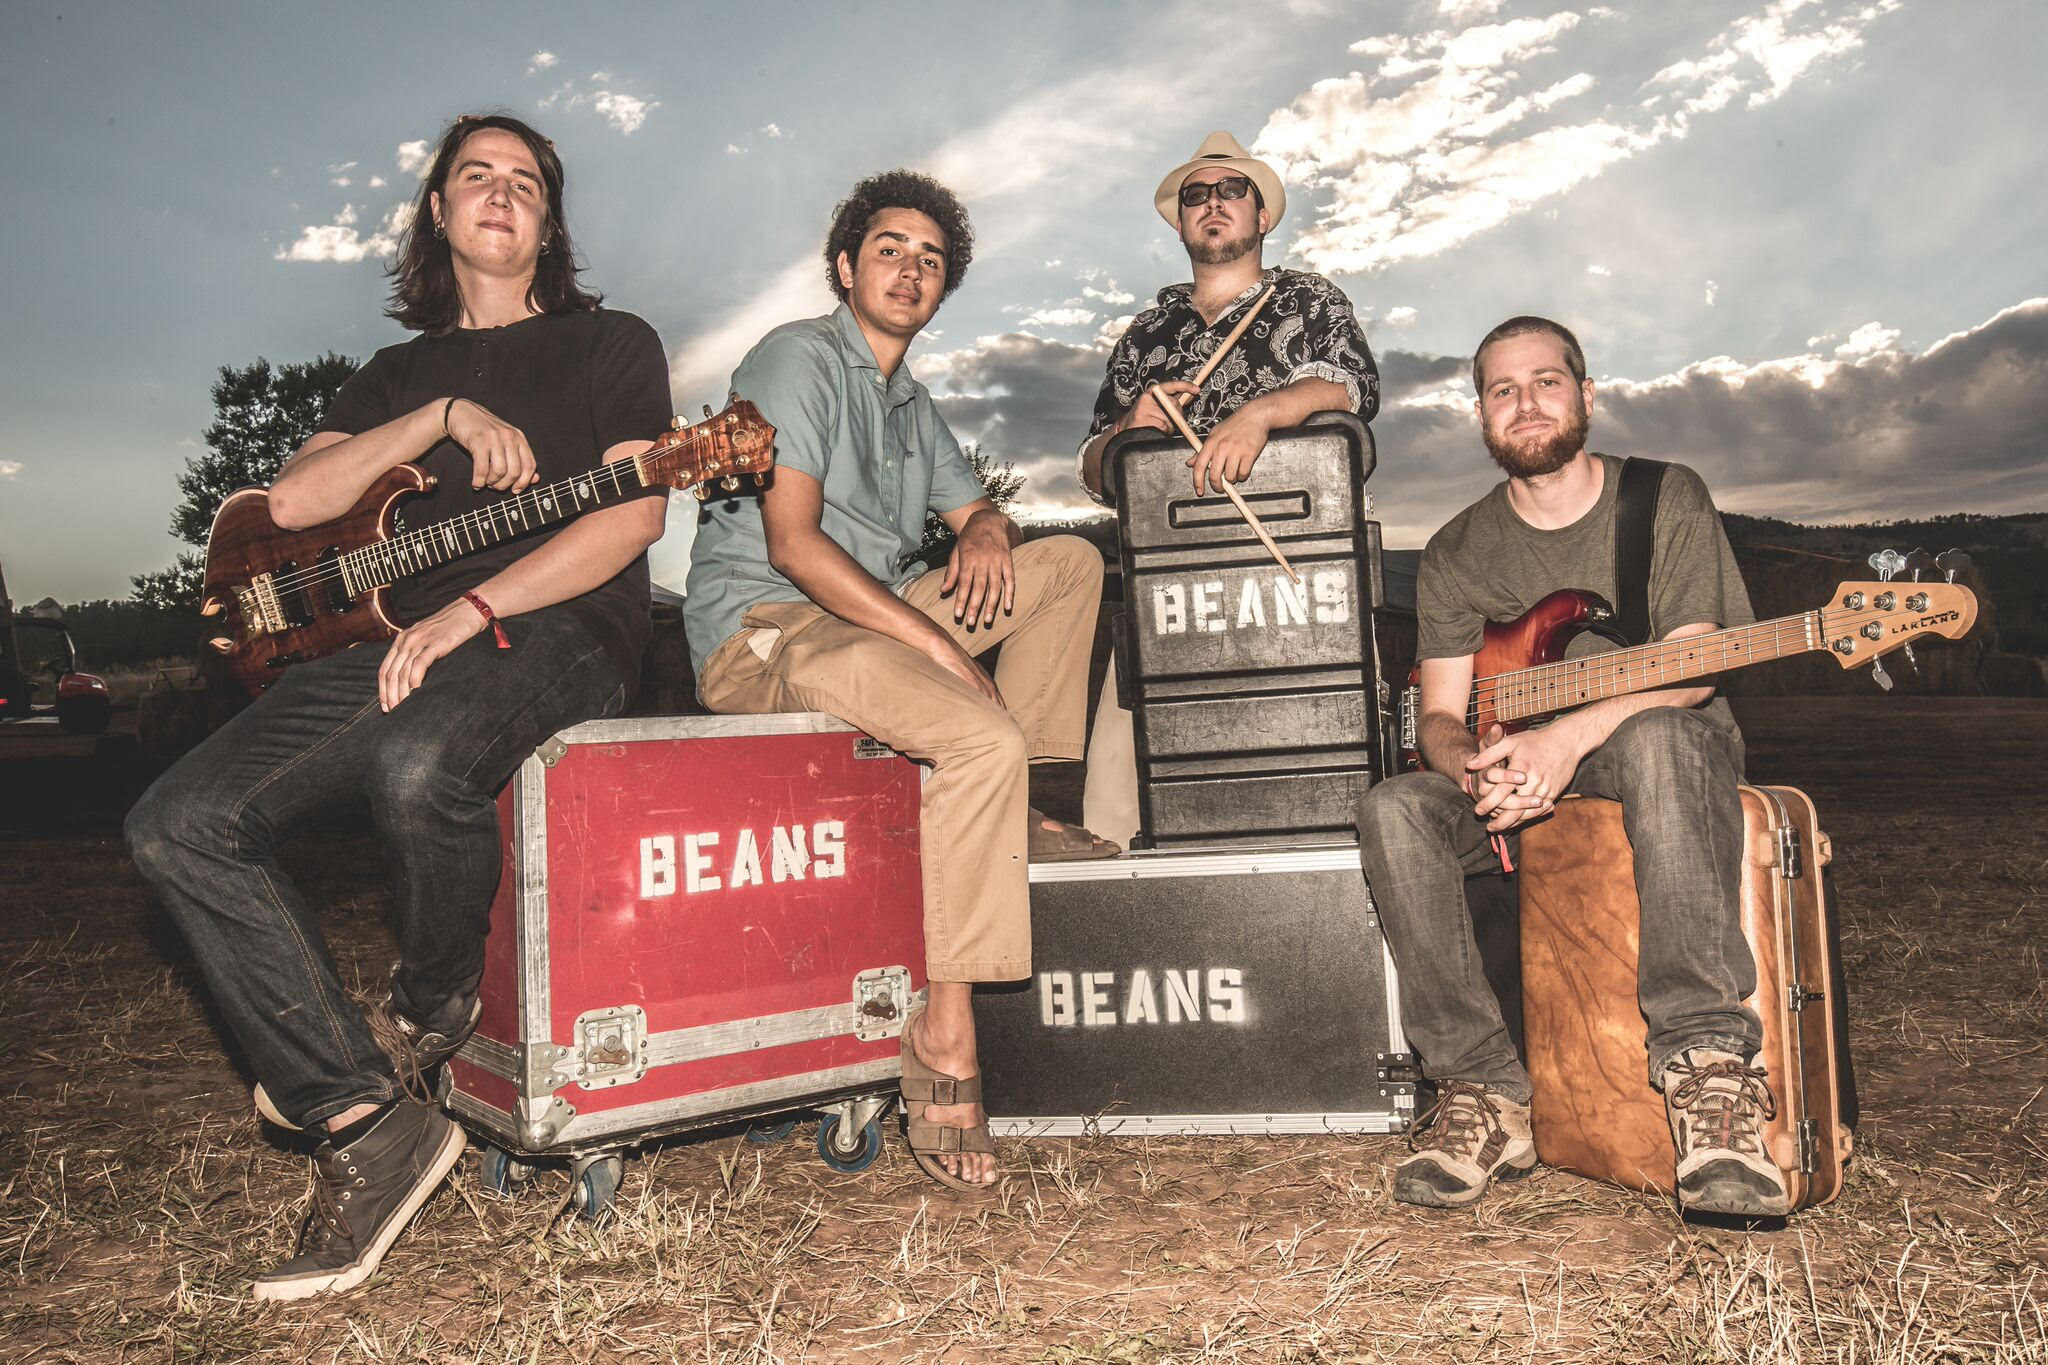 The Colorado band Magic Beans performs at Buffalo Iron Works.